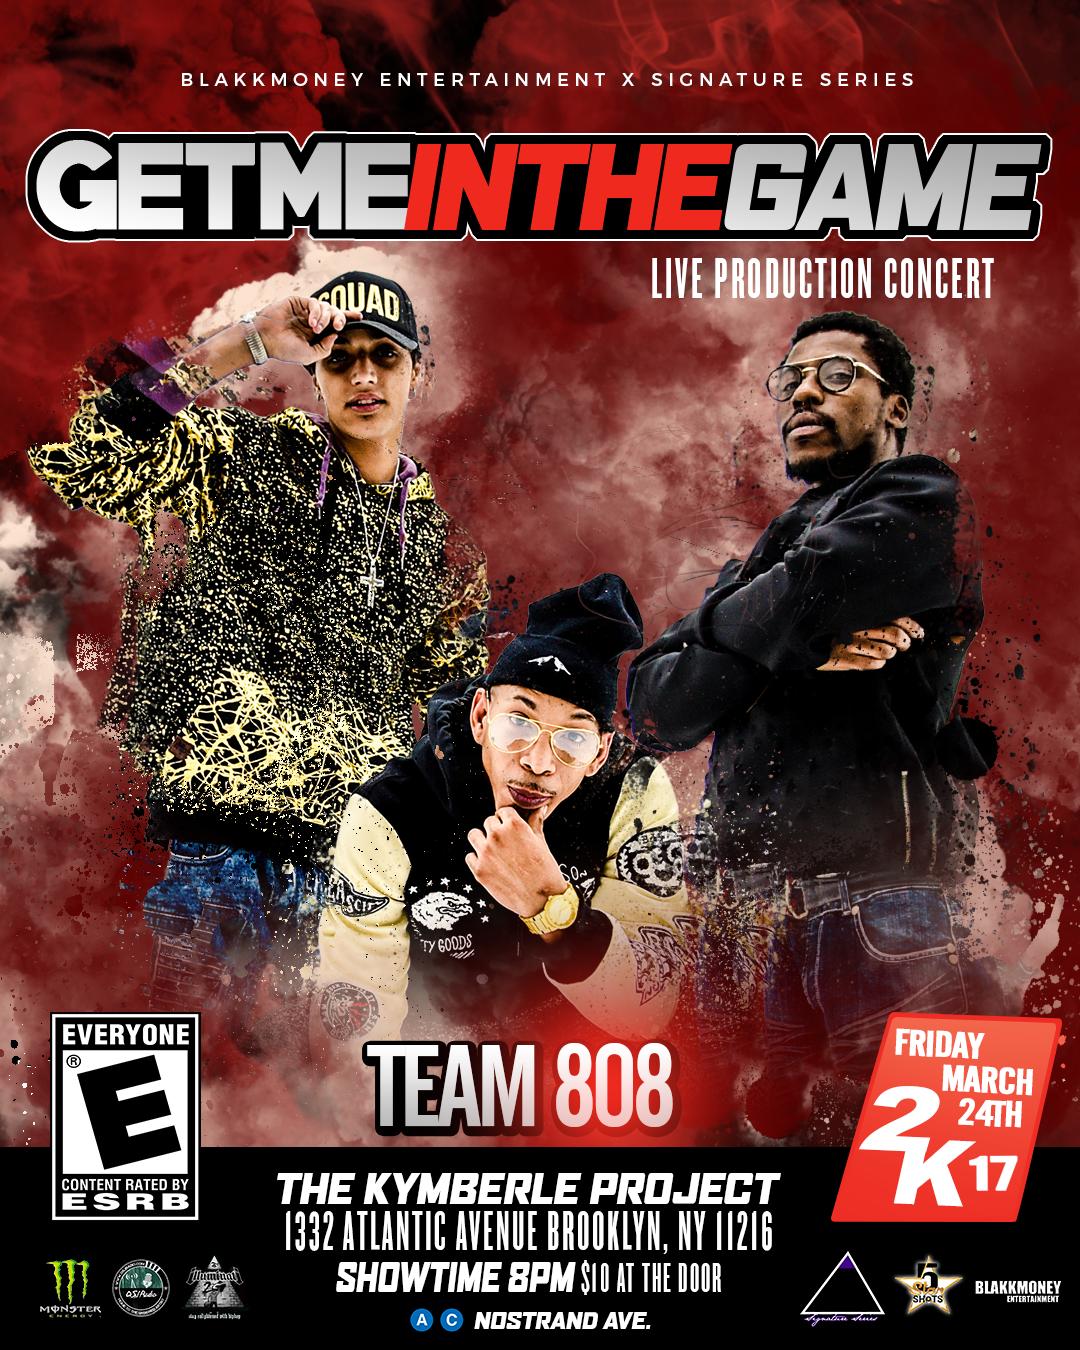 GMITG-team808.png